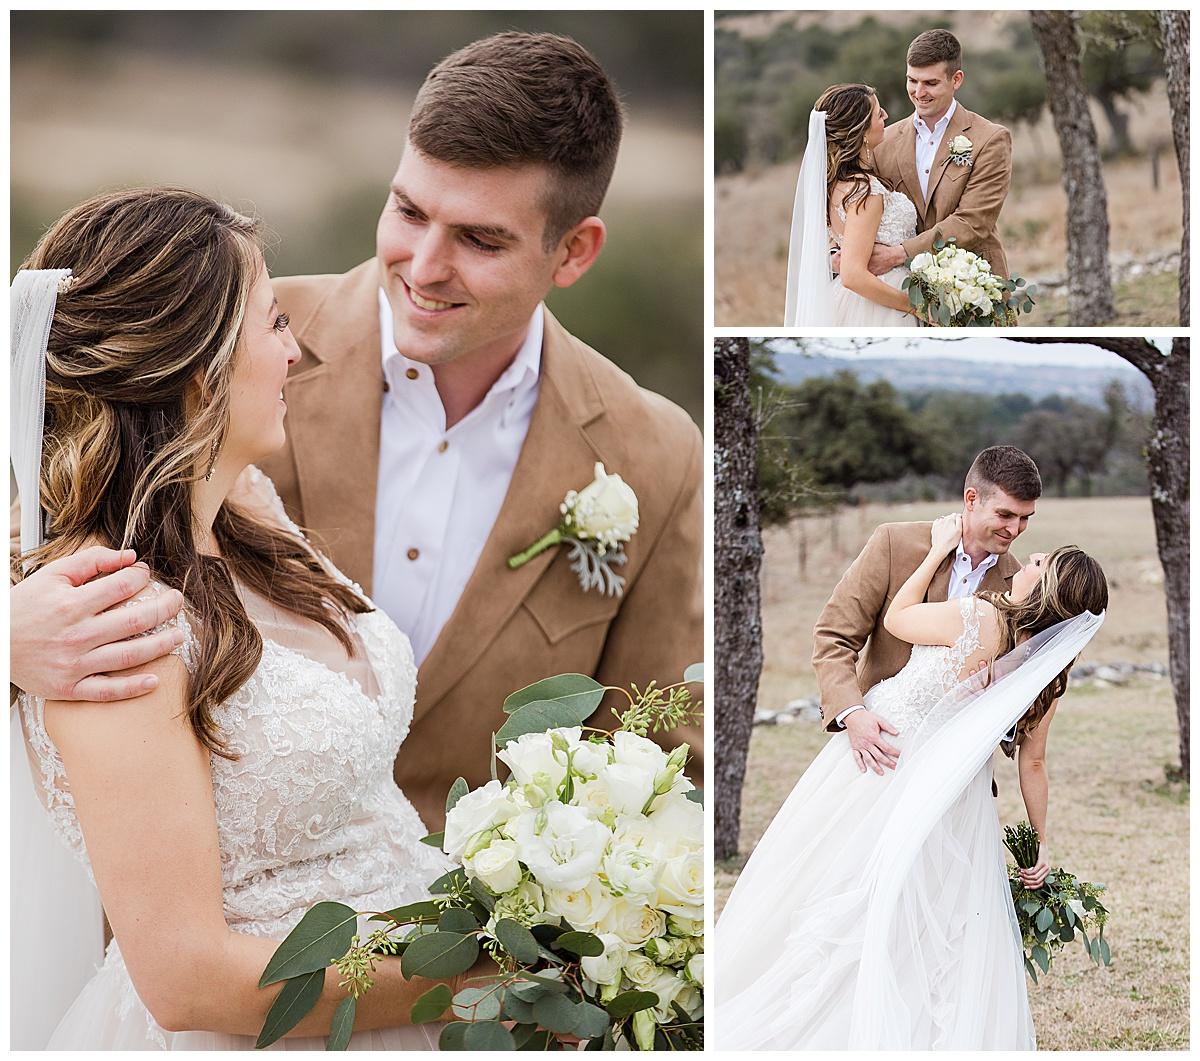 Wedding-Photographer-Texas-Hill-Country-Happy-H-Ranch-Comfor-Texas-Carly-Barton-Photography_0046.jpg